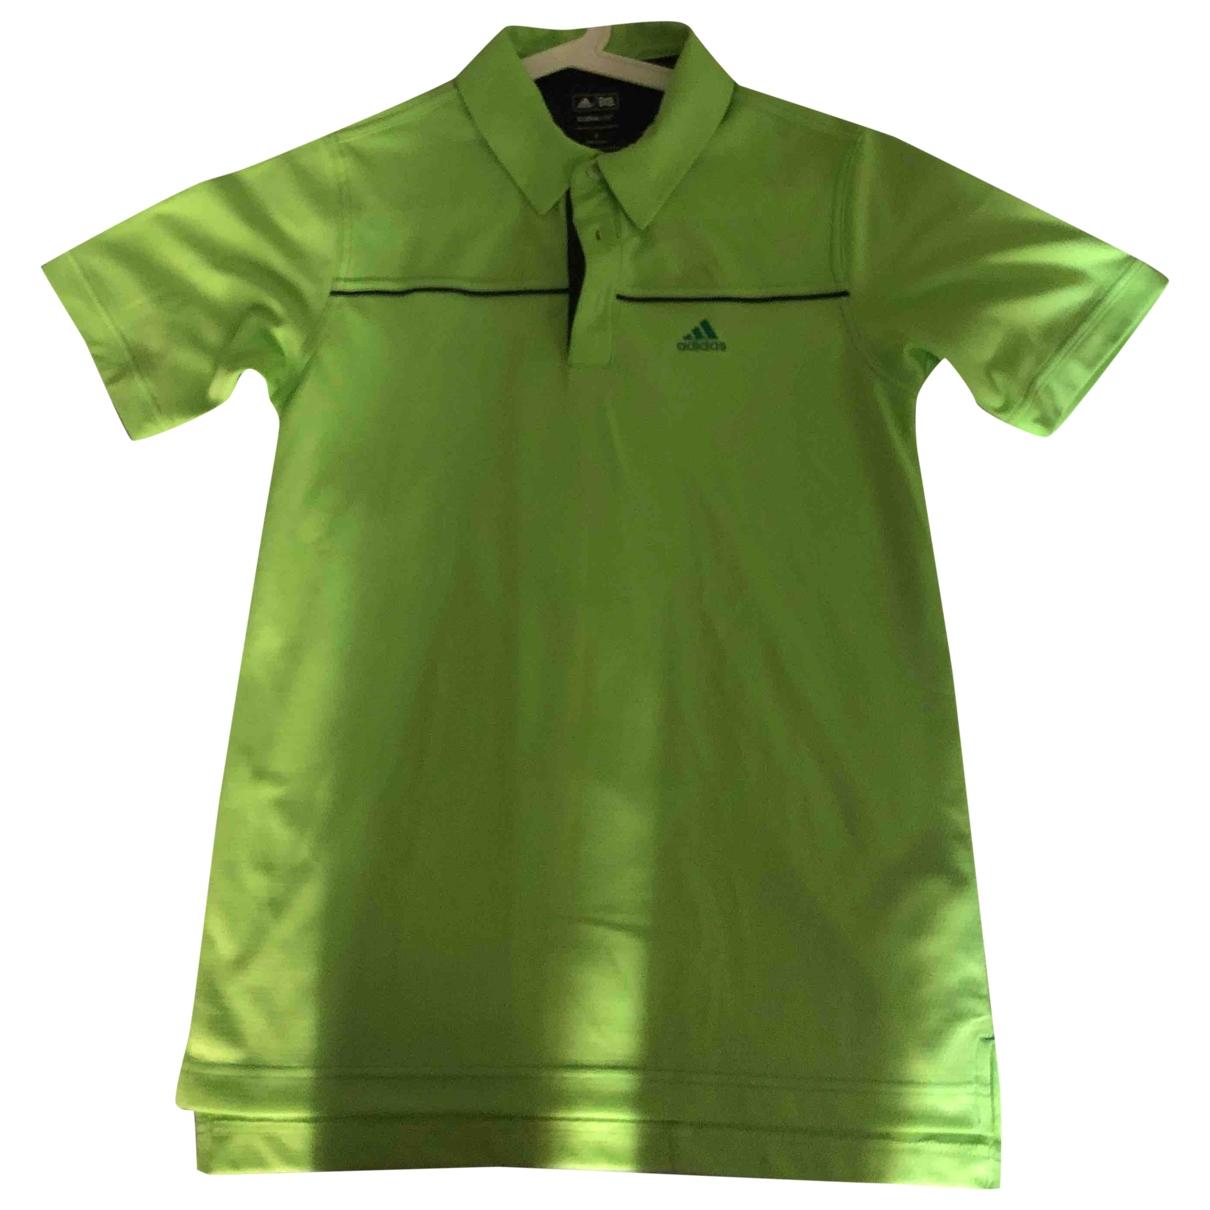 Adidas \N Poloshirts in  Gruen Polyester